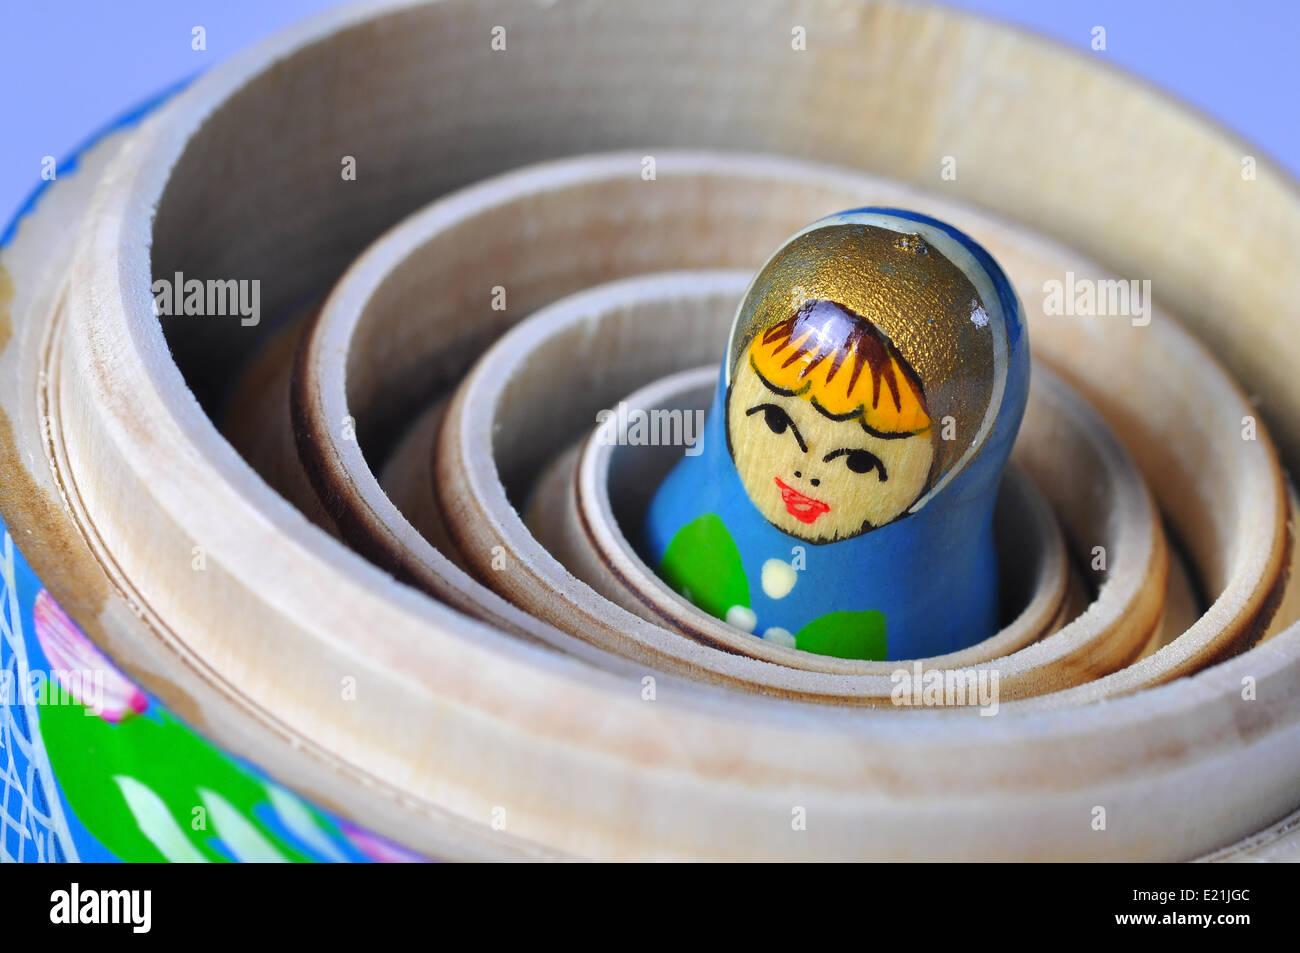 Matrioska Russian Doll - Stock Image